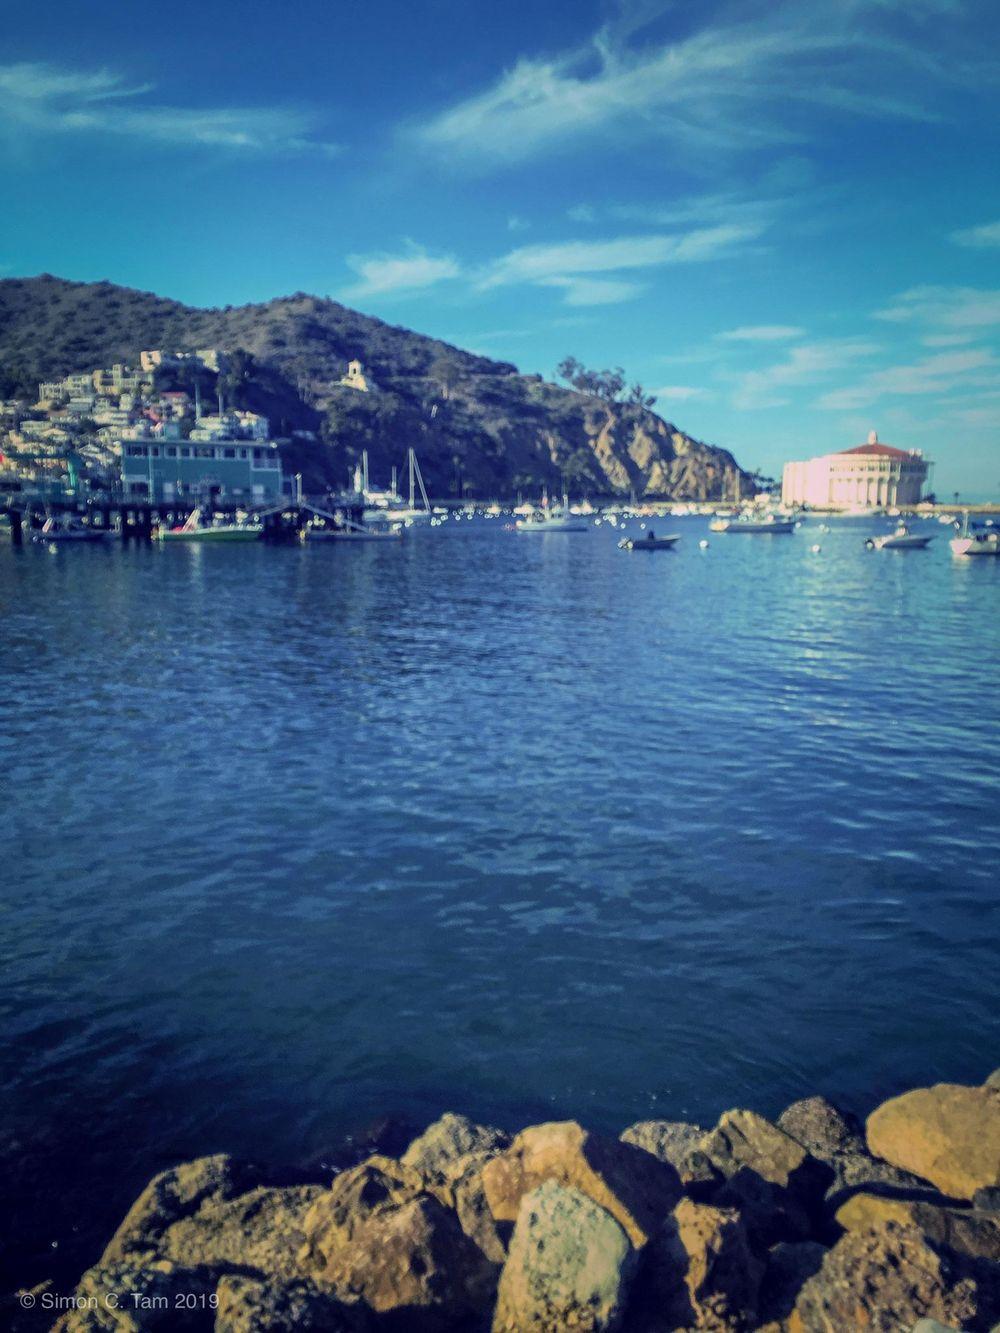 Exploring Santa Catalina Island - image 1 - student project